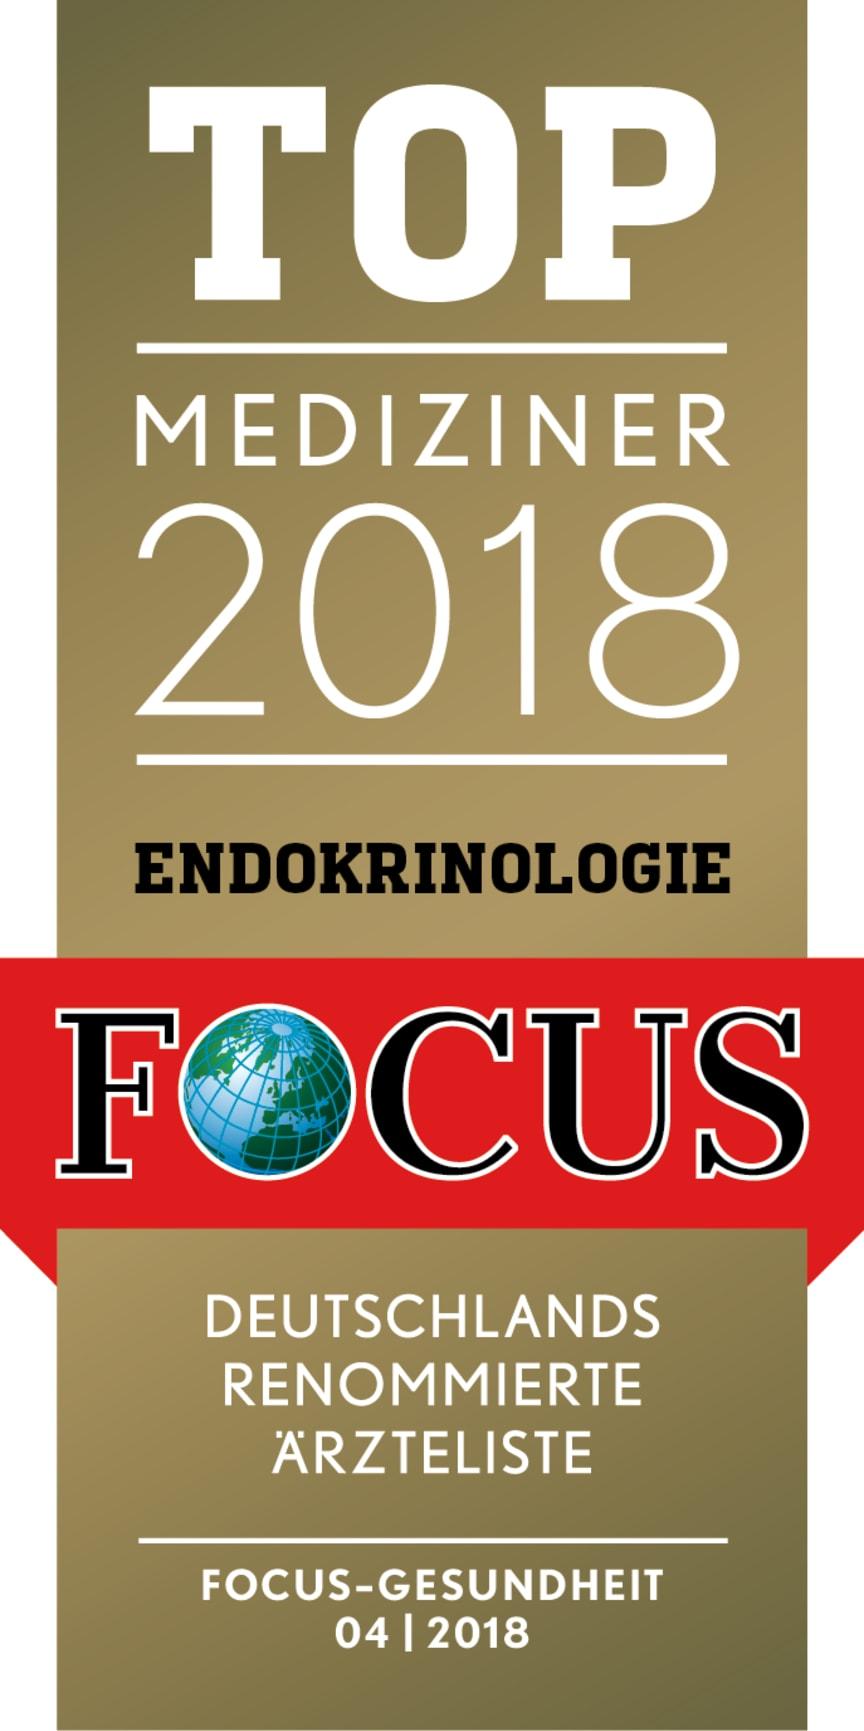 Top Mediziner Siegel Endokrinologie - Prof. Dr. Heide Siggelkow